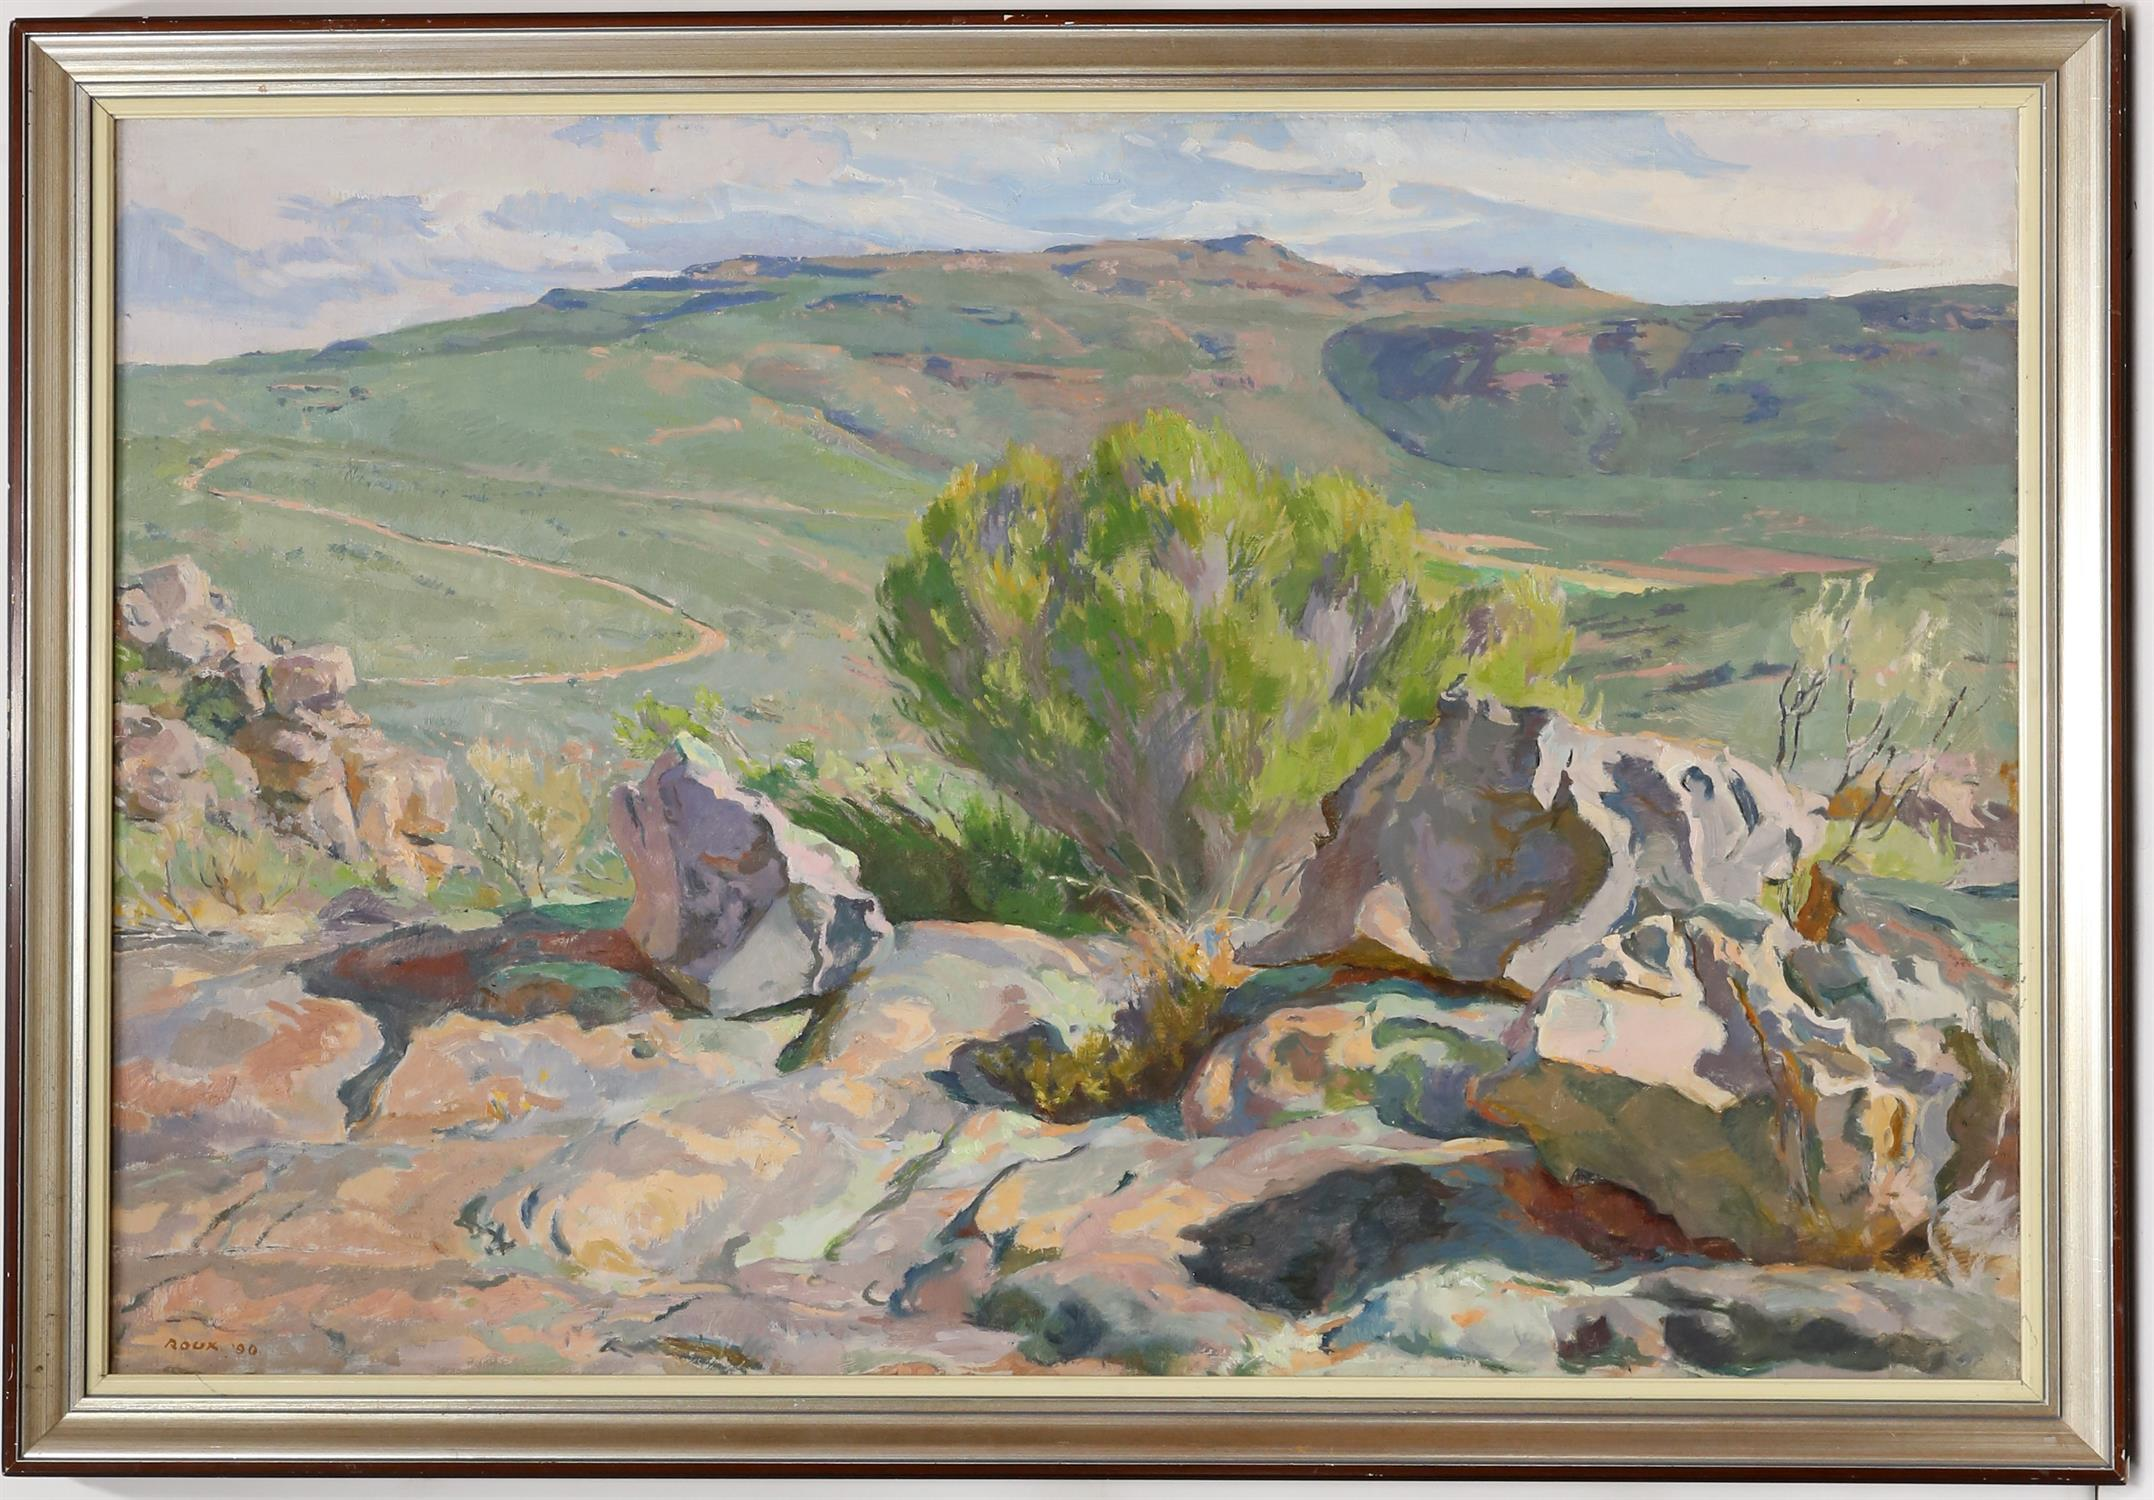 Francois Roux (South African, b. 1927). Cederberg, mountainous landscape. Oil on canvas, - Image 2 of 3